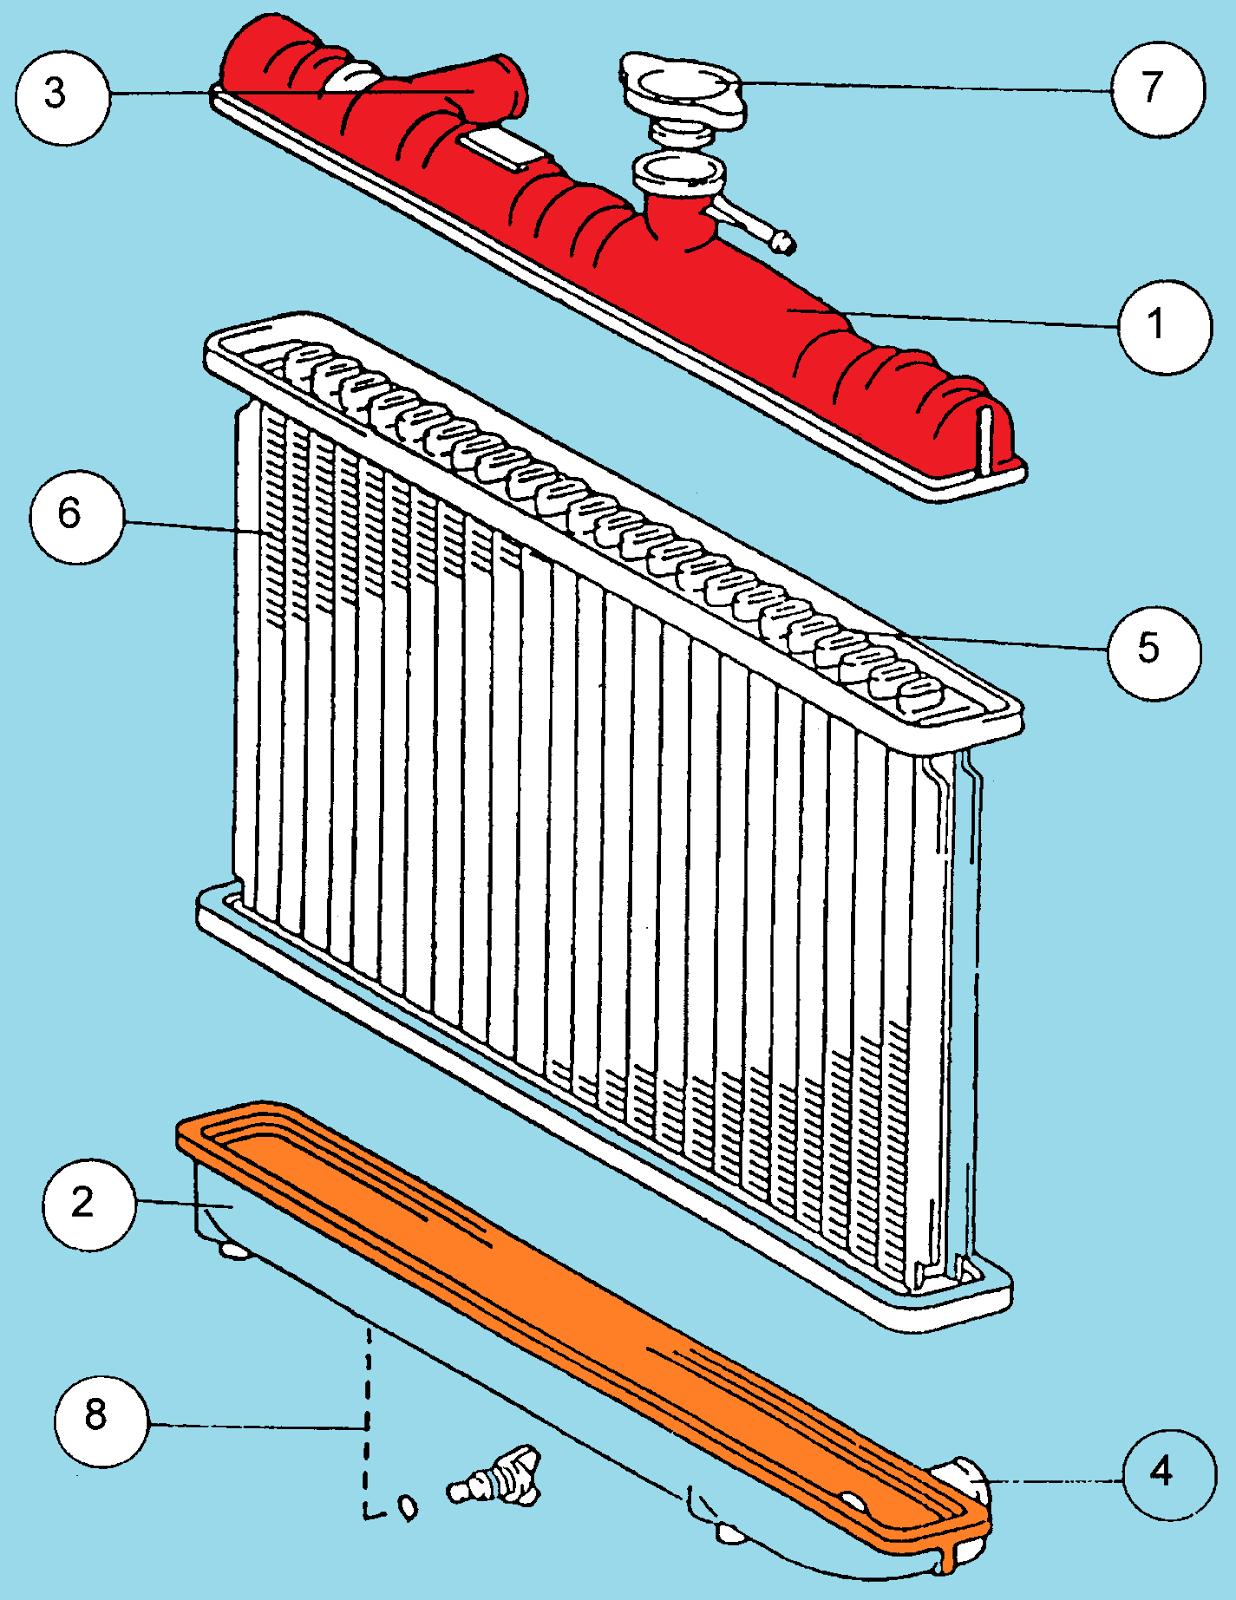 Fungsi Sistem Pendingin : fungsi, sistem, pendingin, Radiator, Sistem, Pendingin, Mobil, Fijay, Tekhnik, Makmur